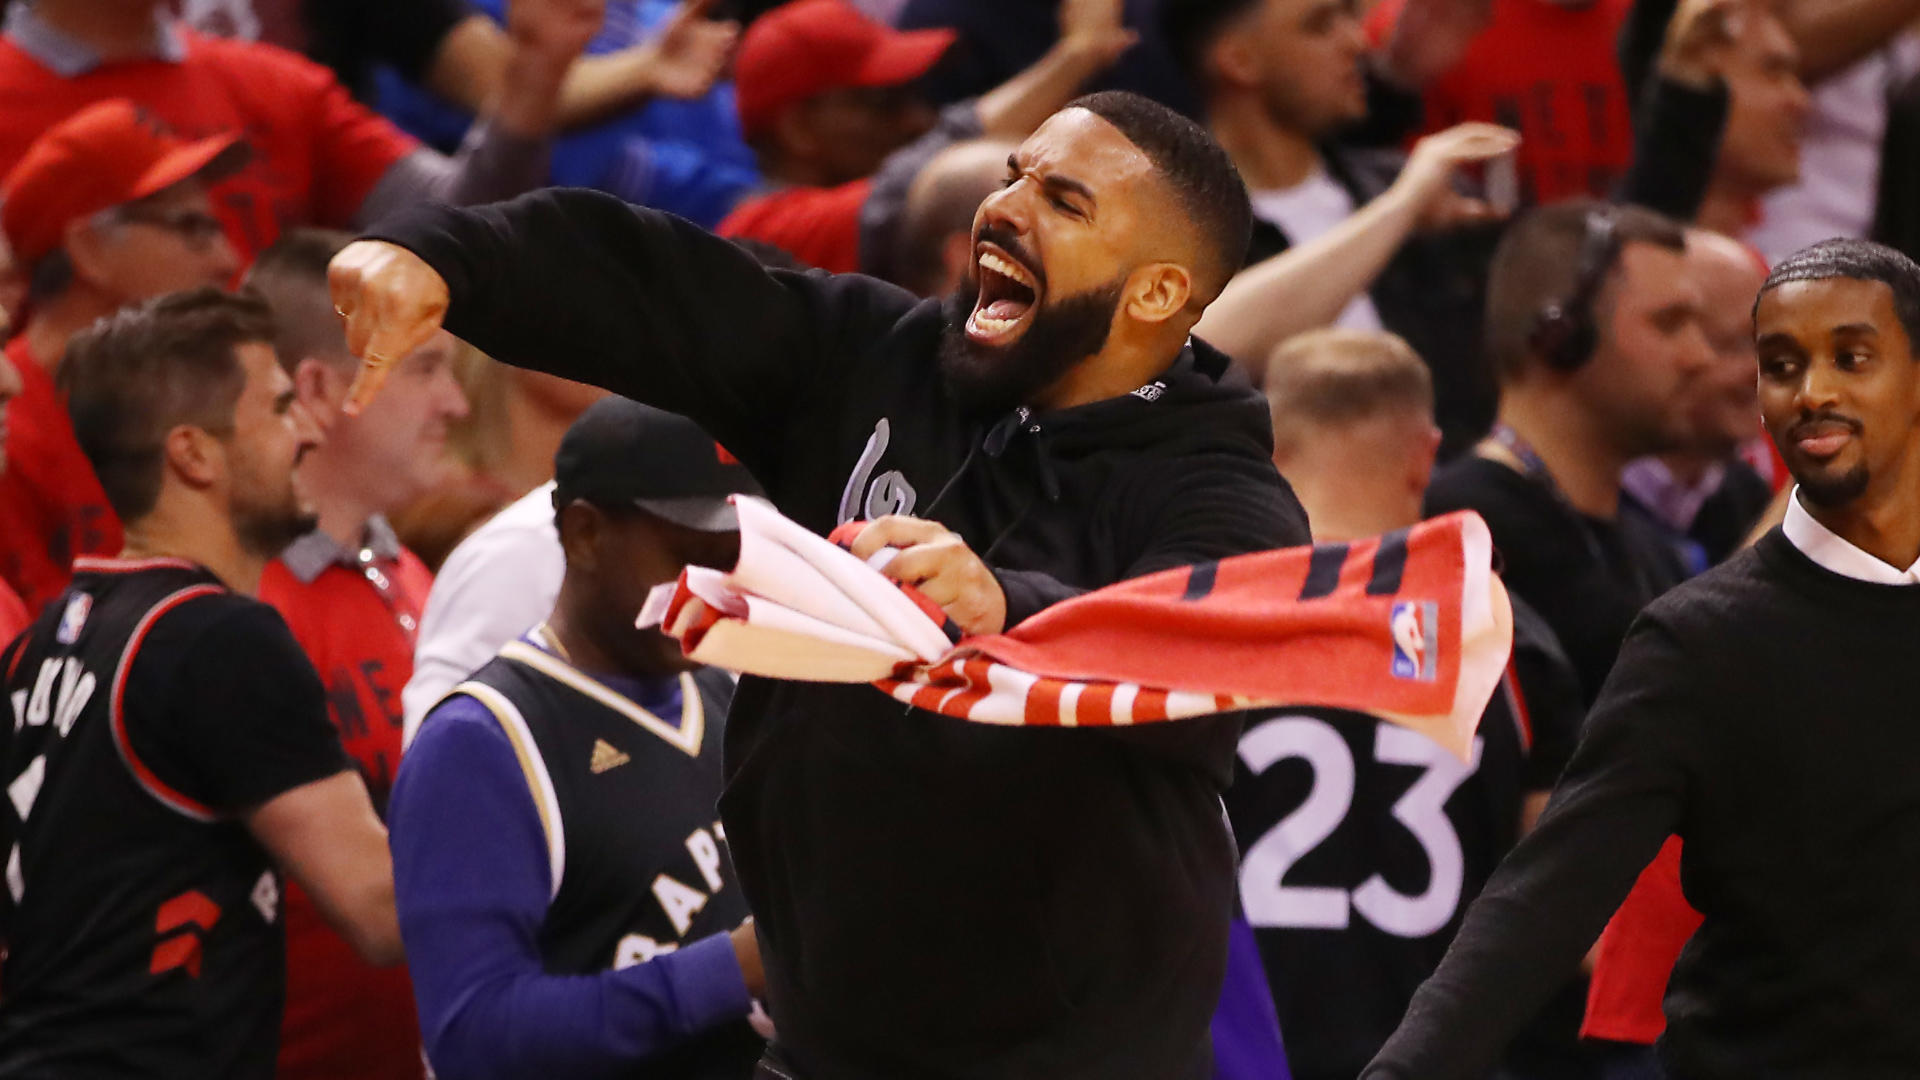 Bucks vs. Raptors Game 6 score, takeaways: Kawhi Leonard leads Toronto to first NBA Finals in franchise history